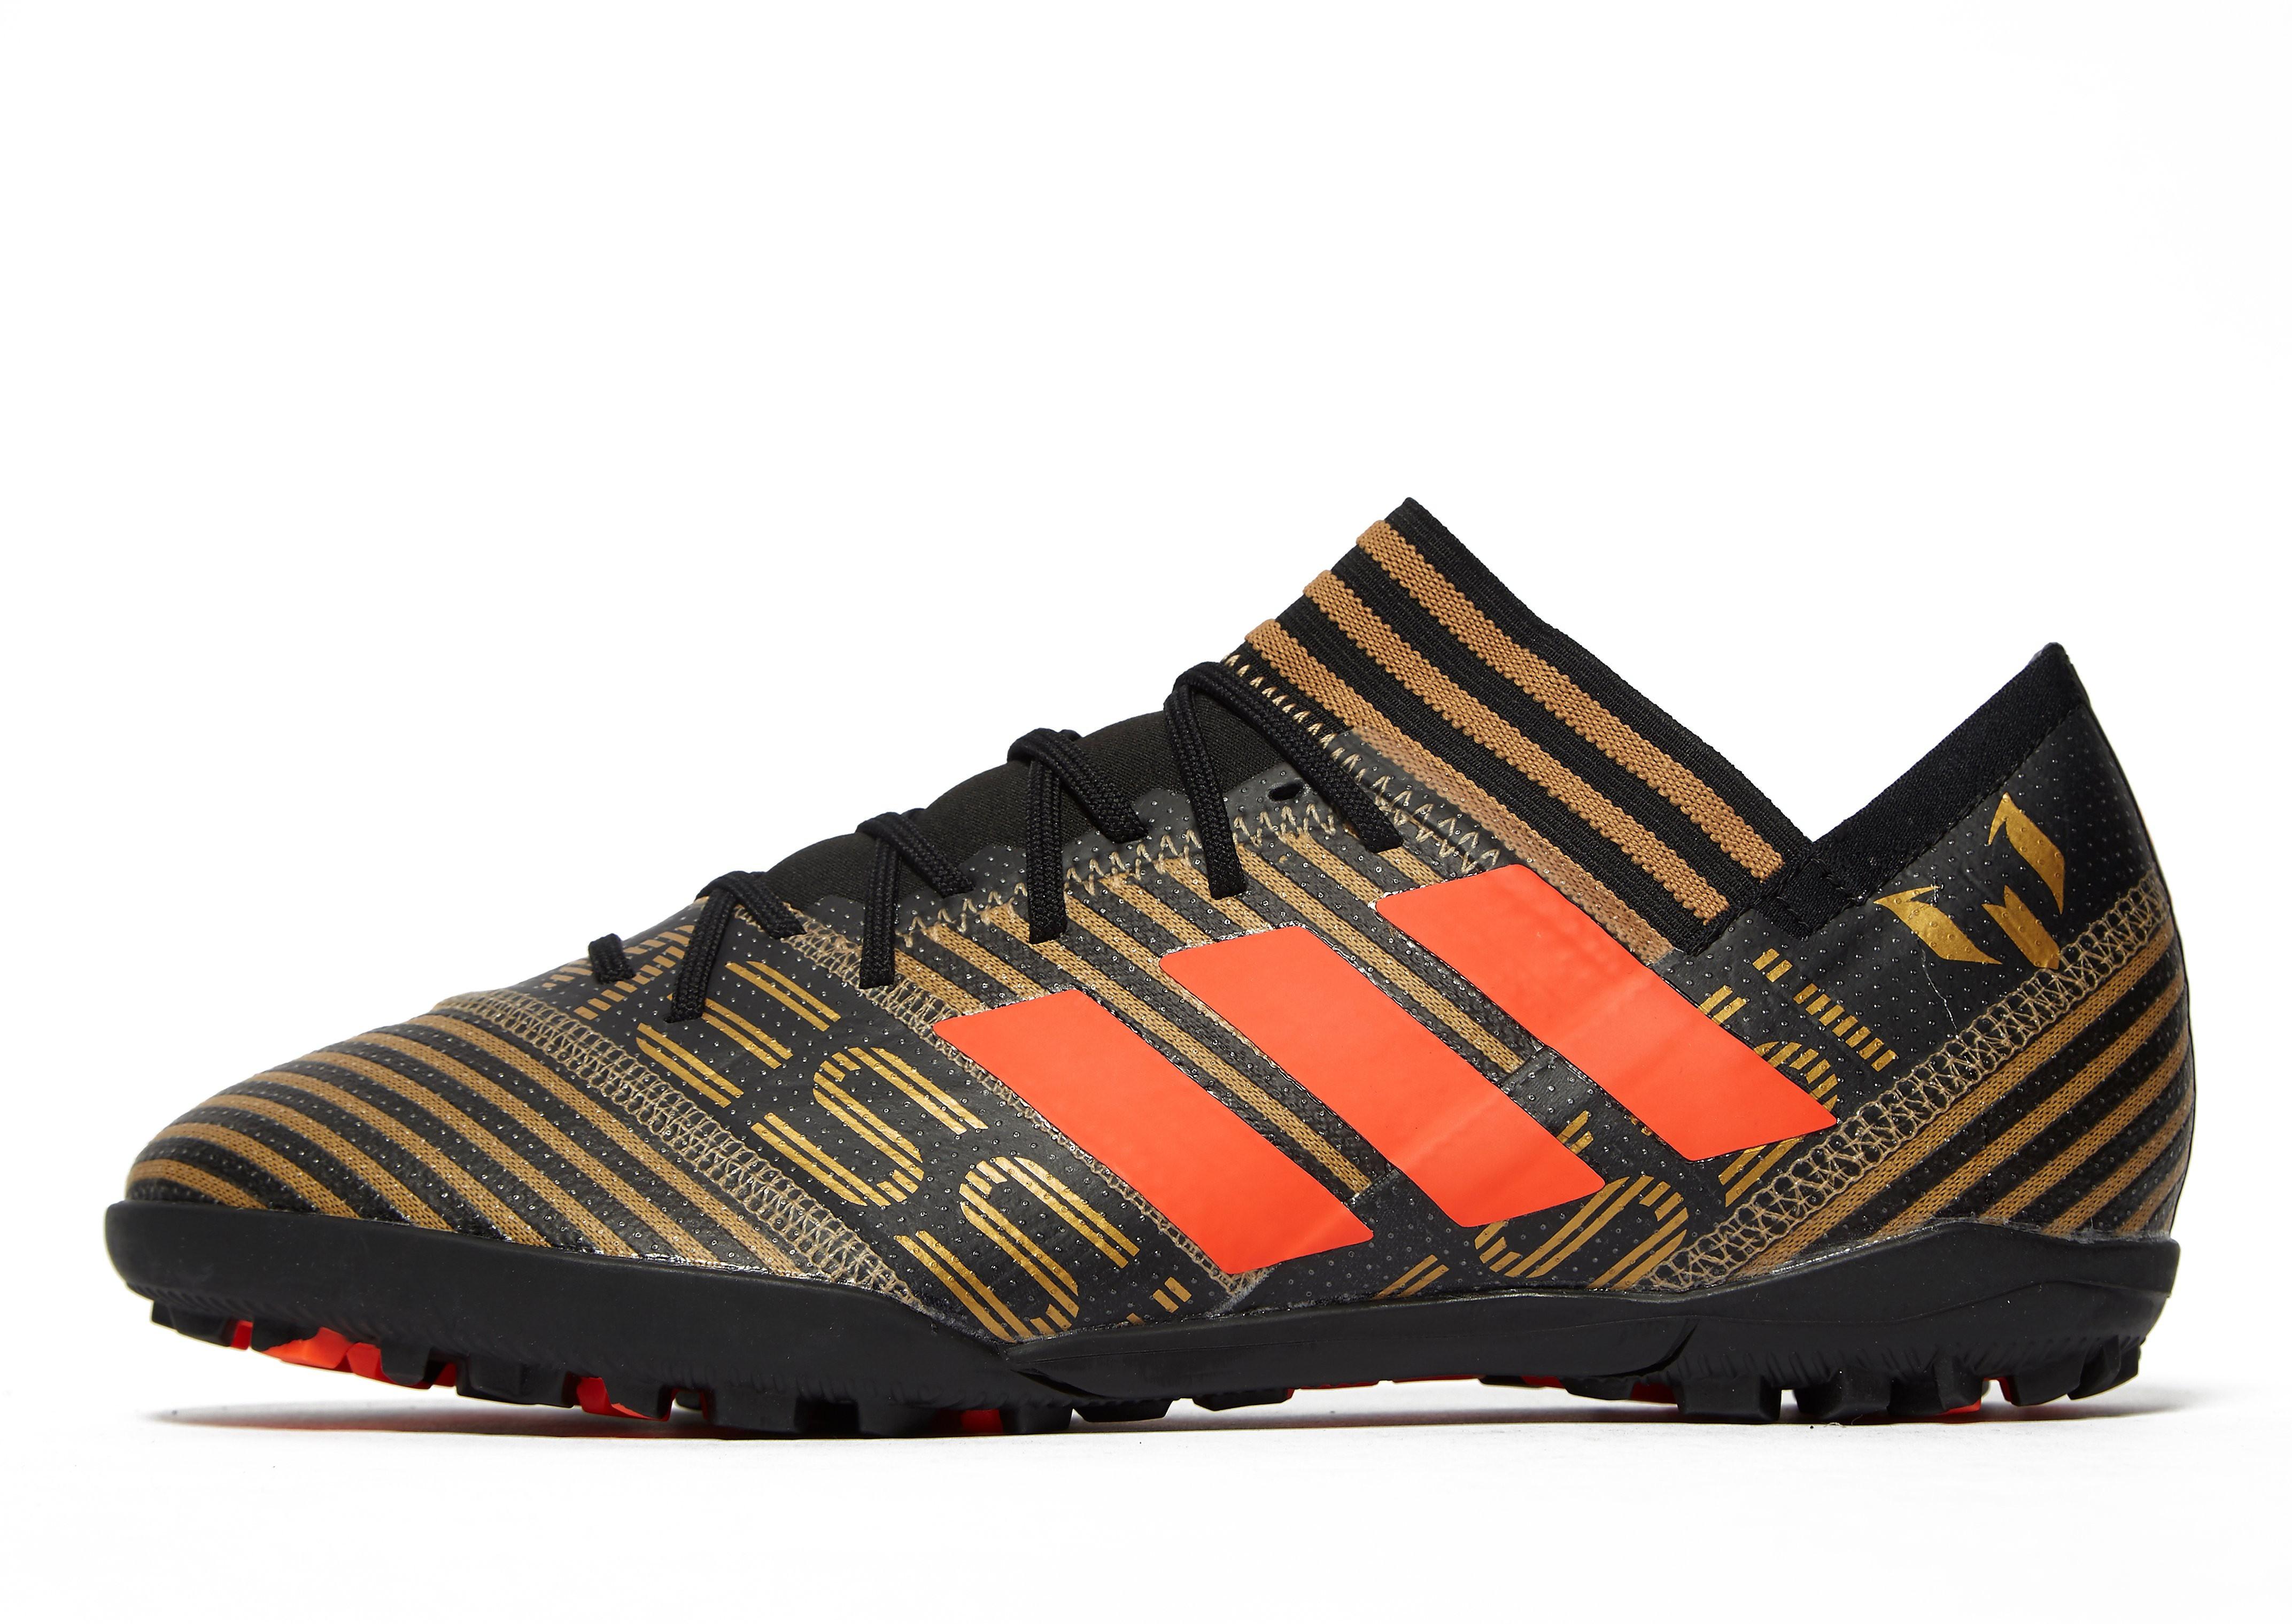 adidas SkyStalker Nemeziz Messi 17.3 TF